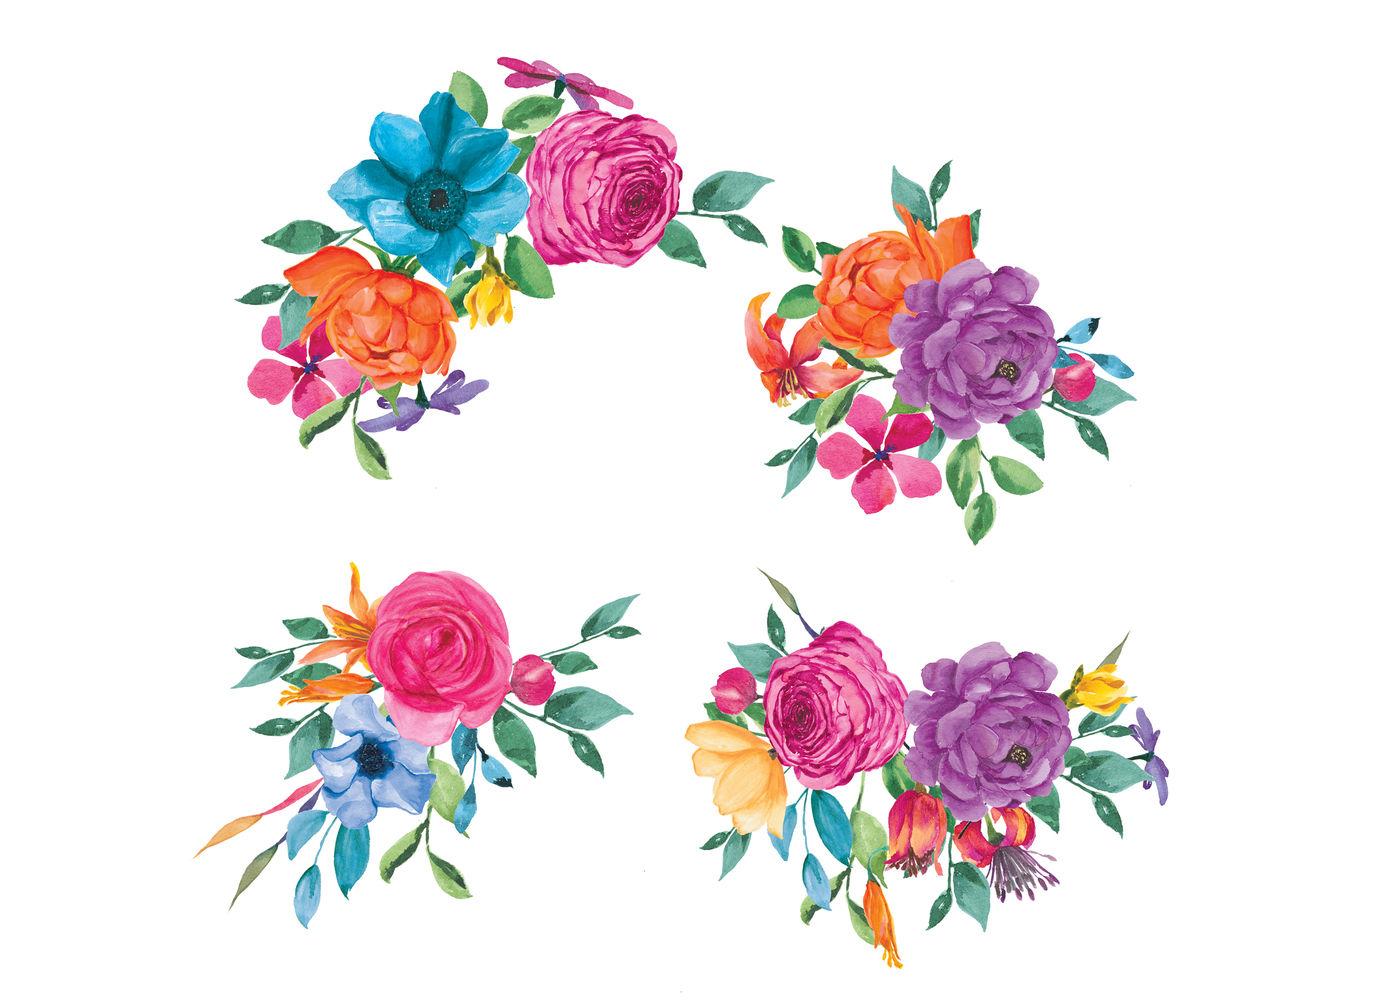 Watercolor Fiesta Flowers Clip Art By Patishop Art ... (1400 x 1007 Pixel)